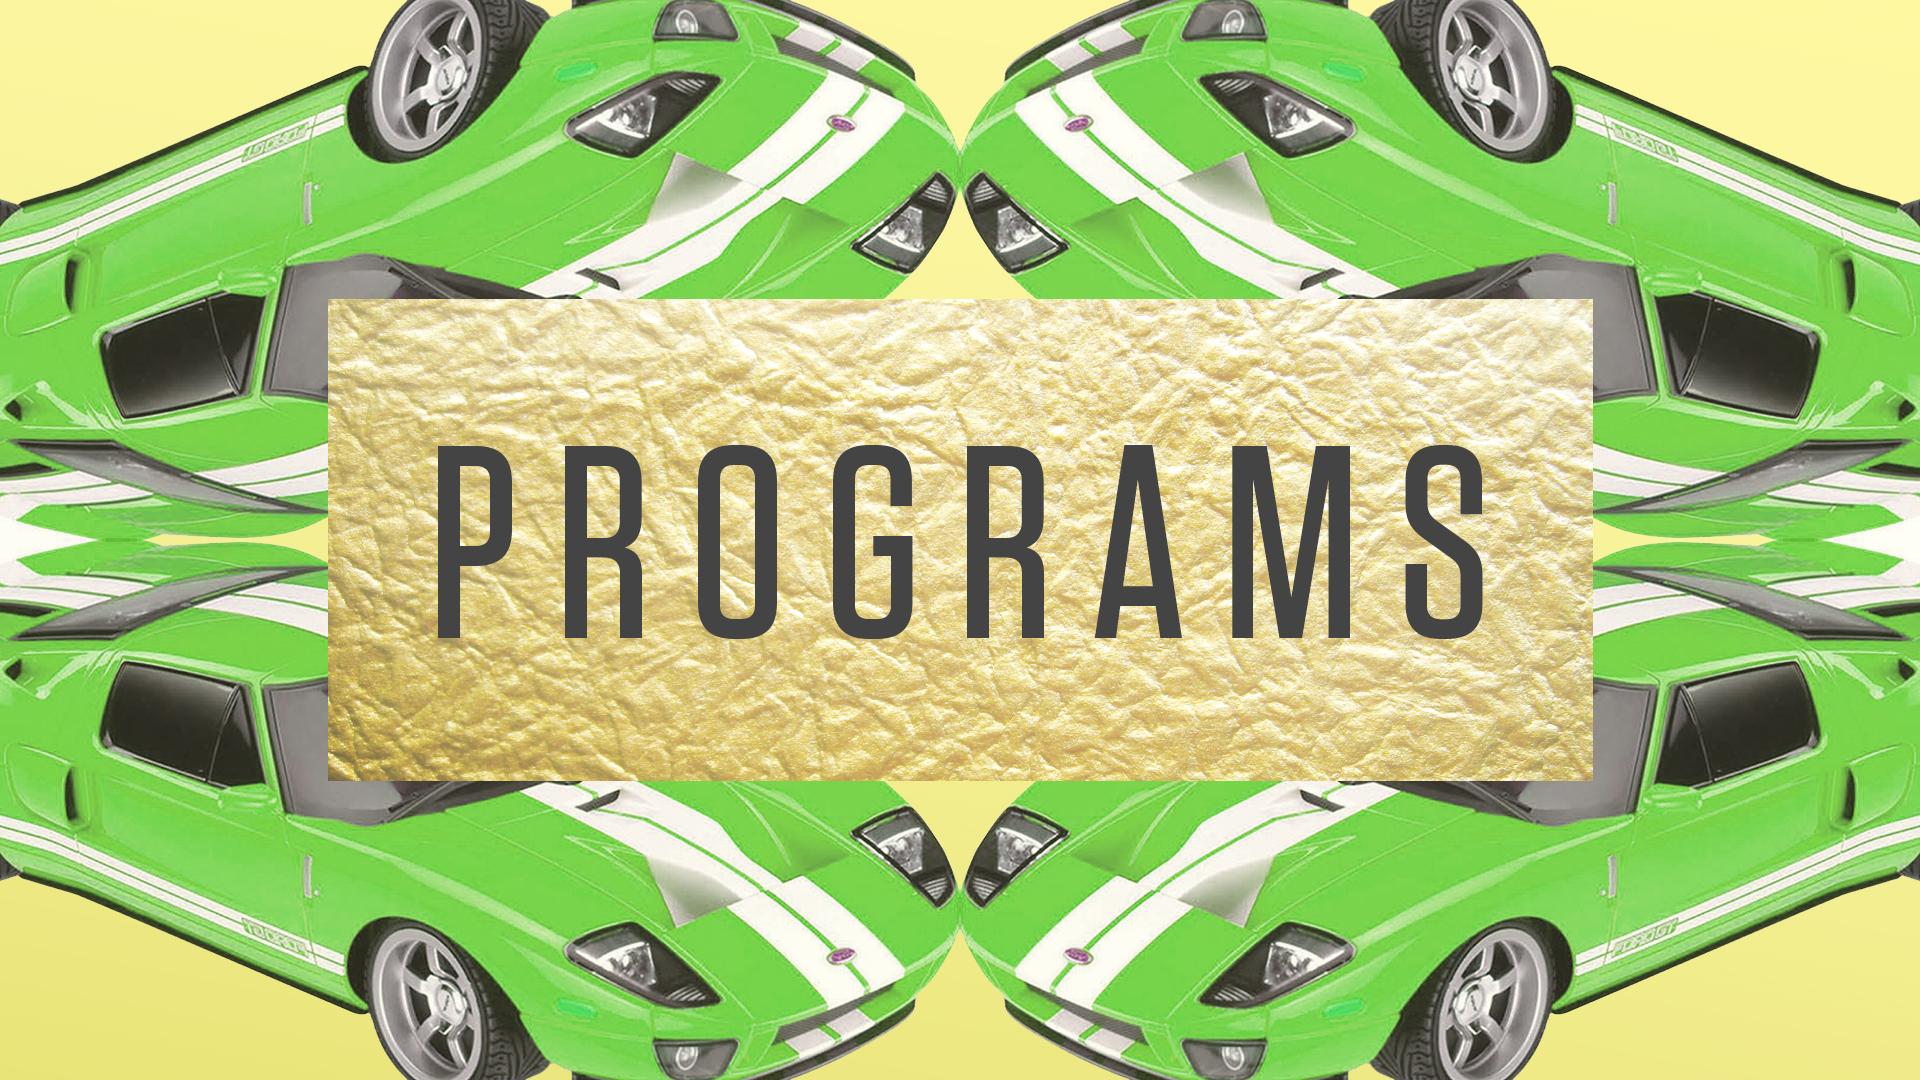 Programs Image2.jpg